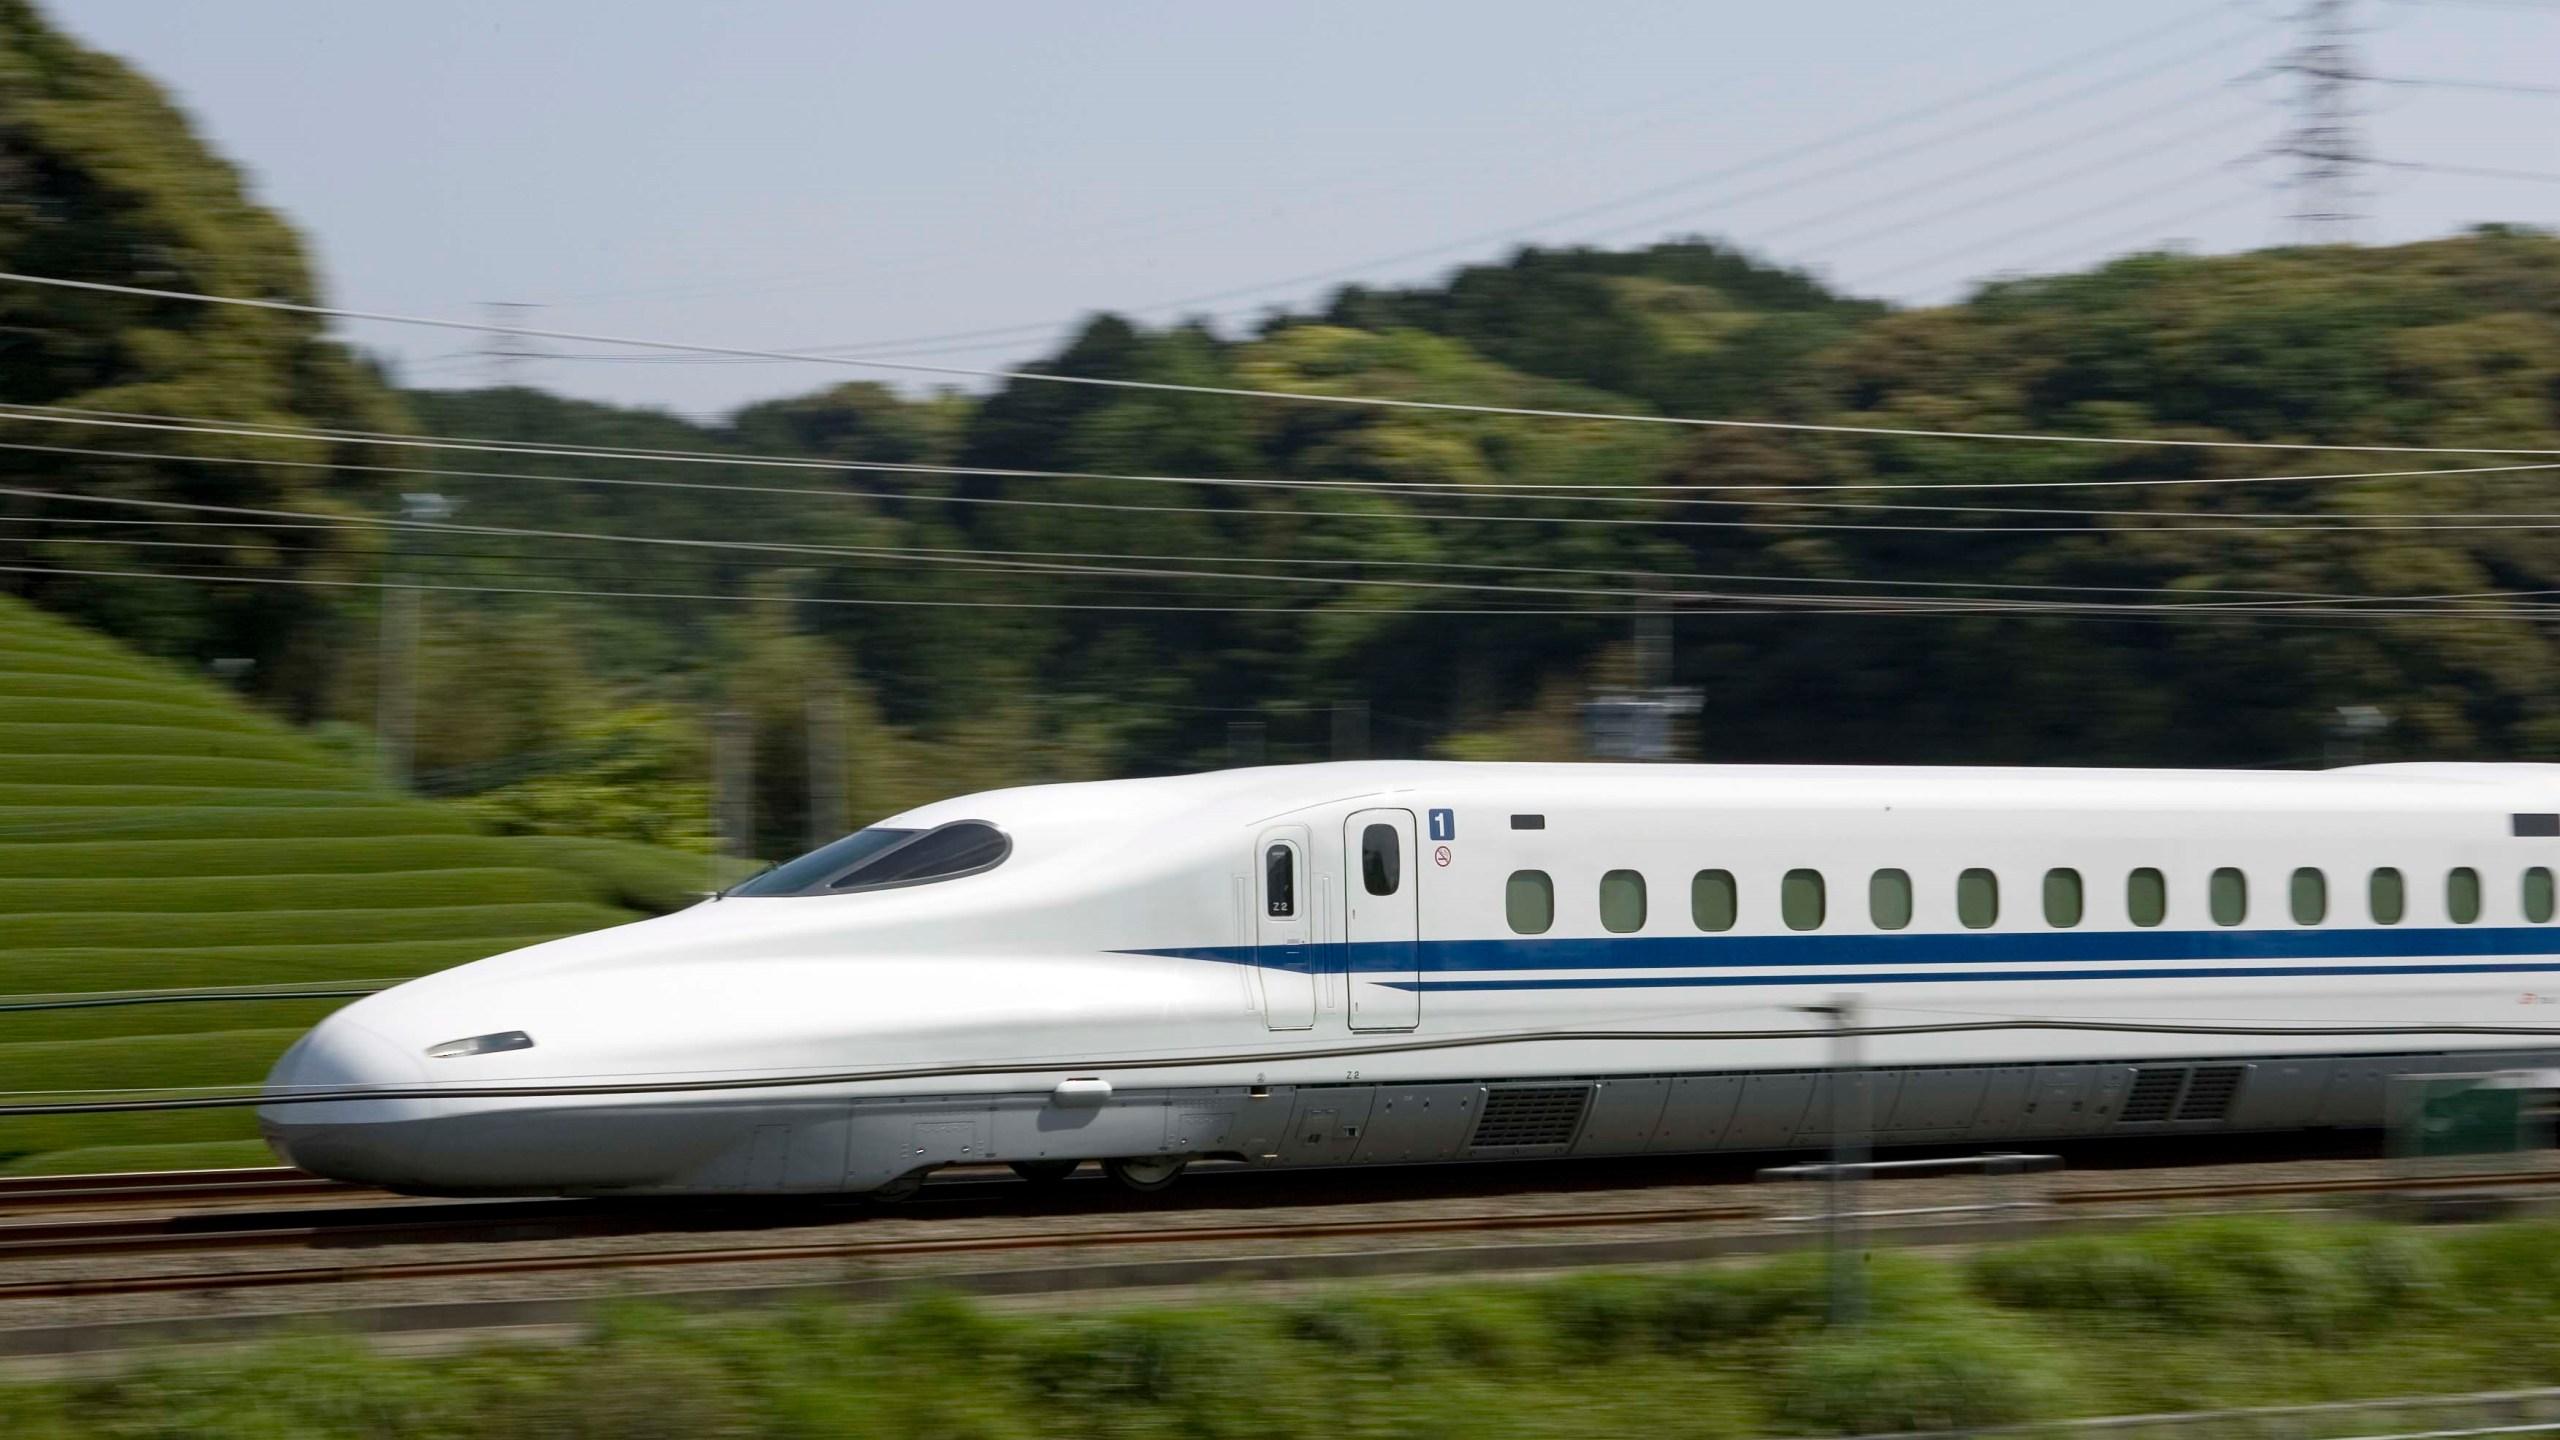 train_1462393578514.jpg